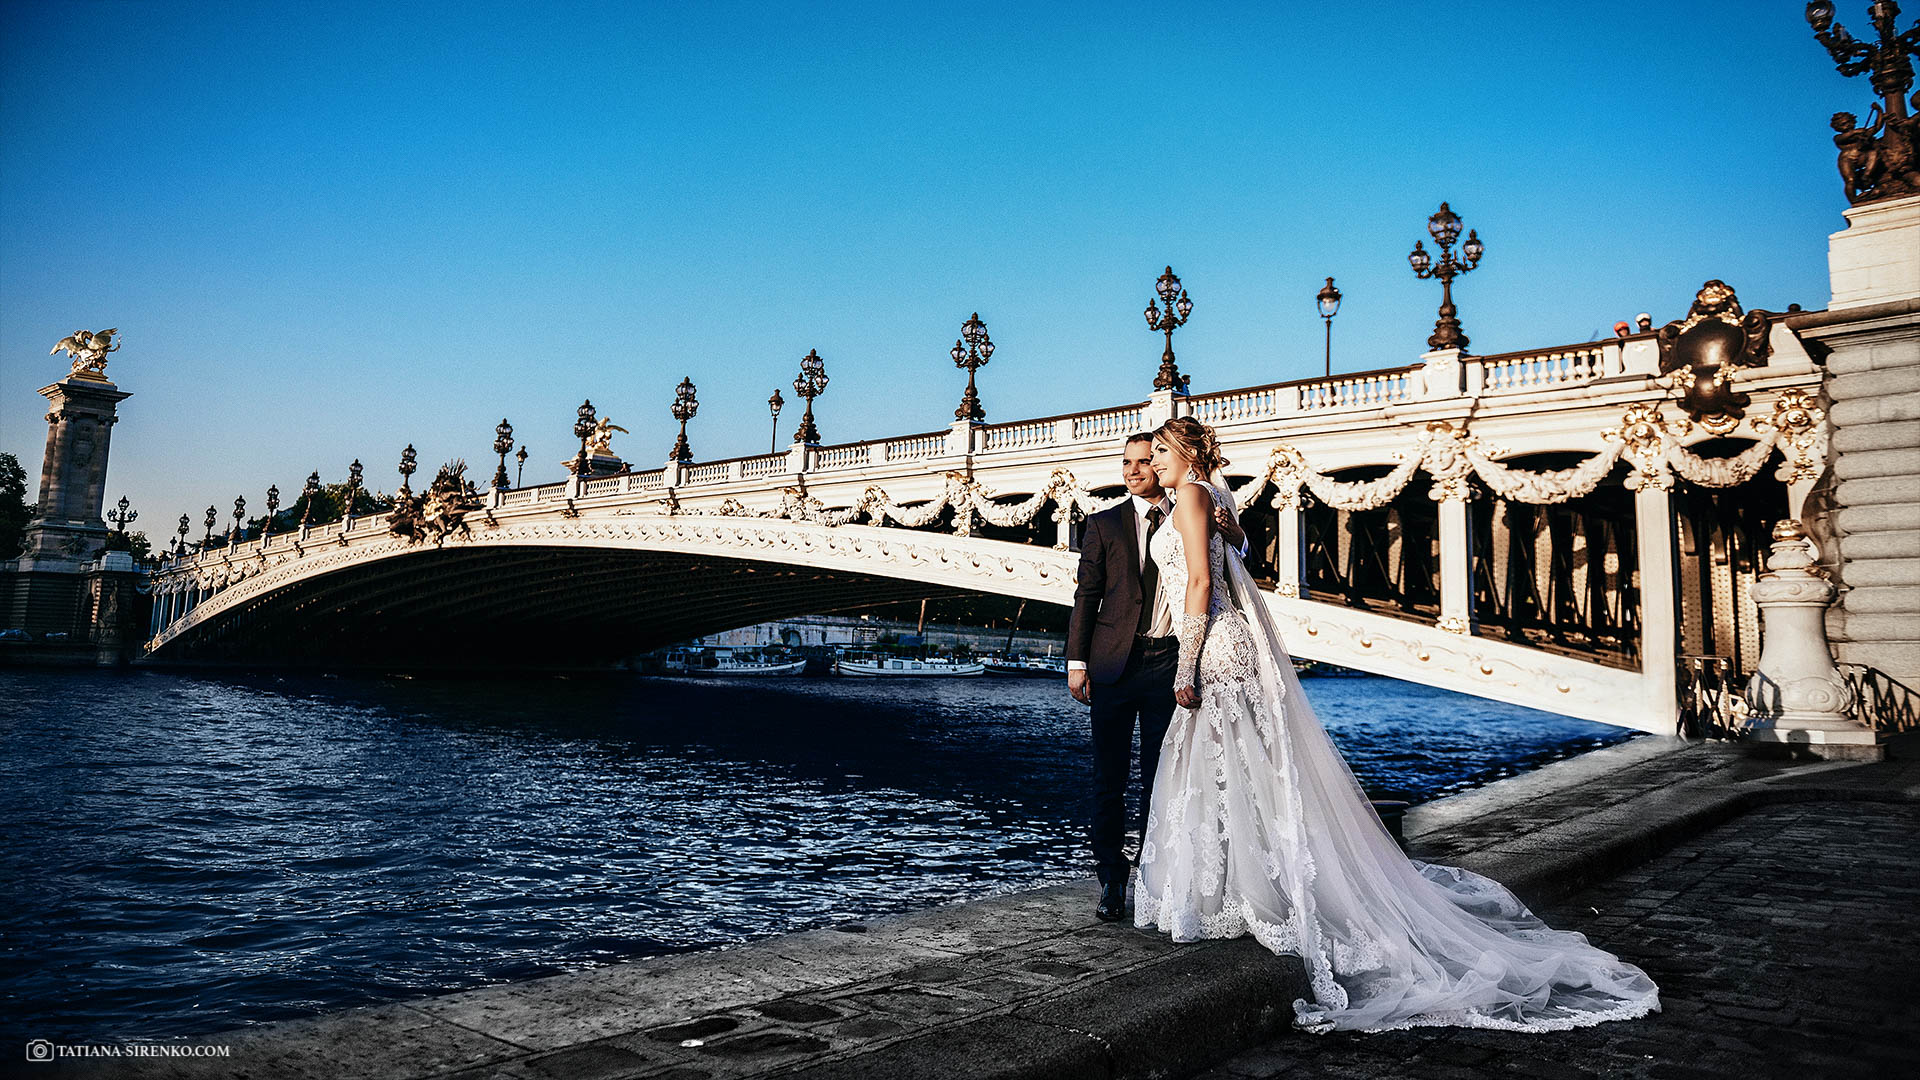 Услуги фотографа на свадьбув Париже